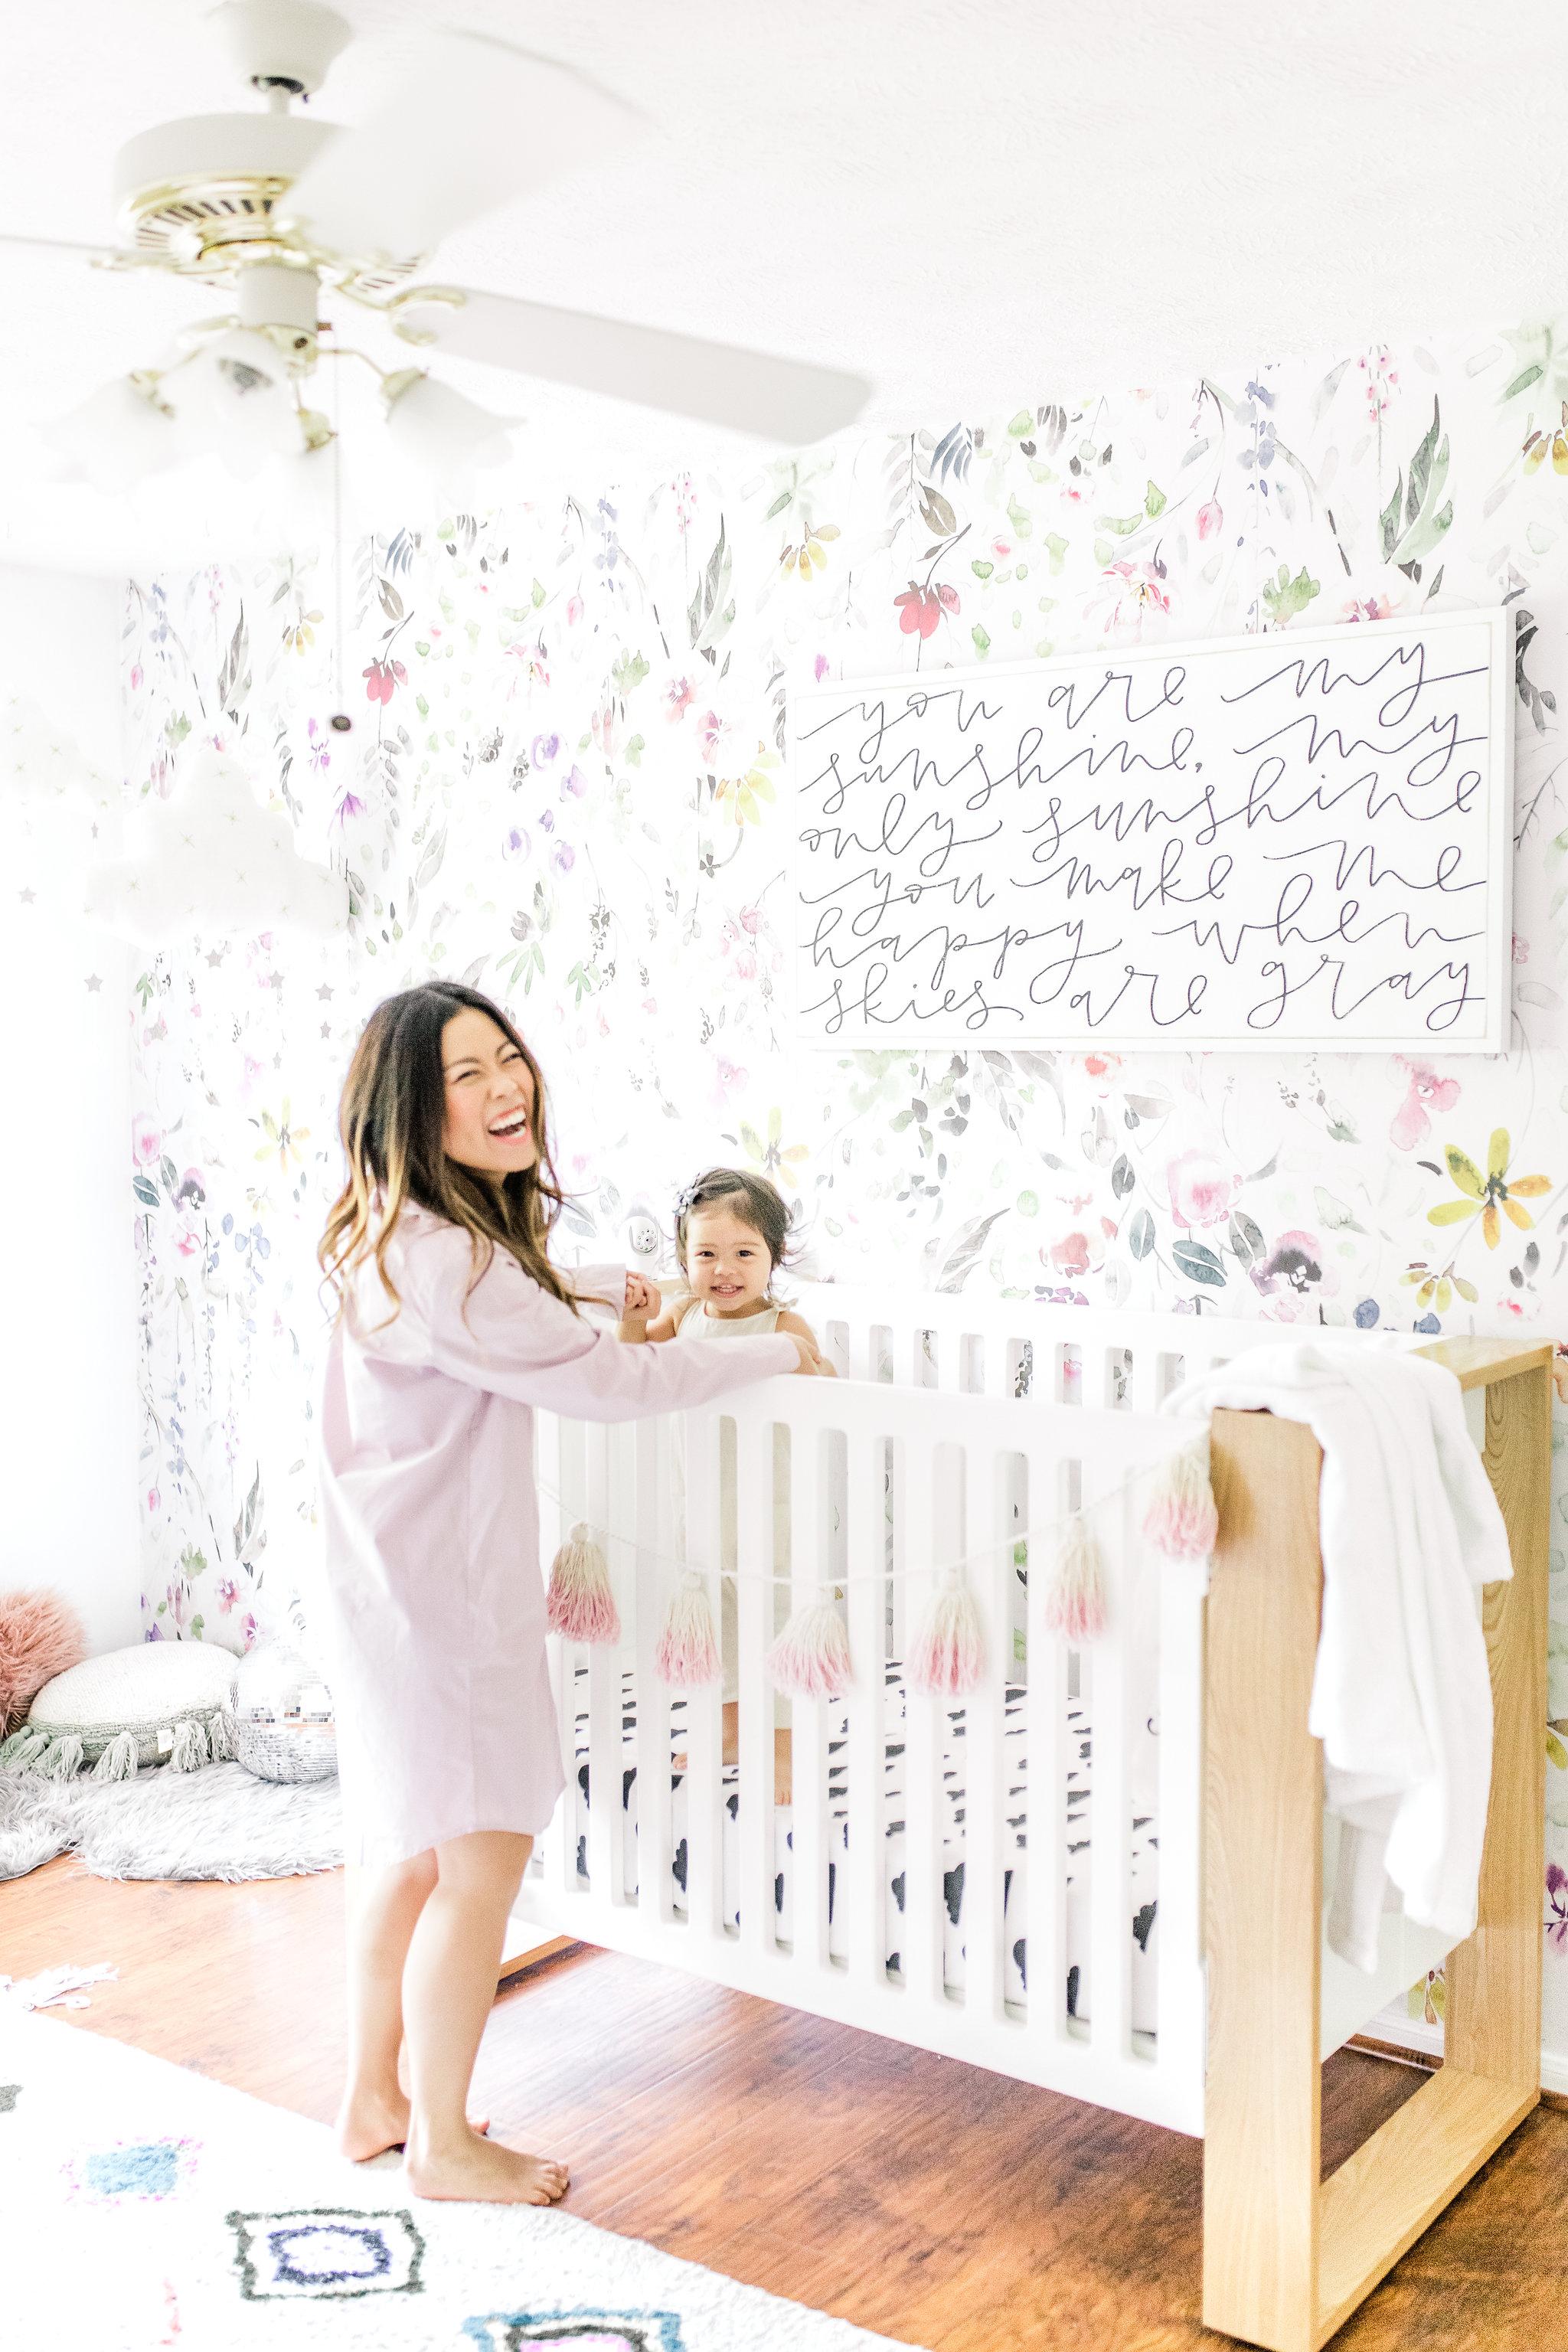 Joyfullygreen The Company Store Unisex White Fluffy Robe Monogramed Mother's Day Gift Idea. Wall paper nursery inspiration.jpg